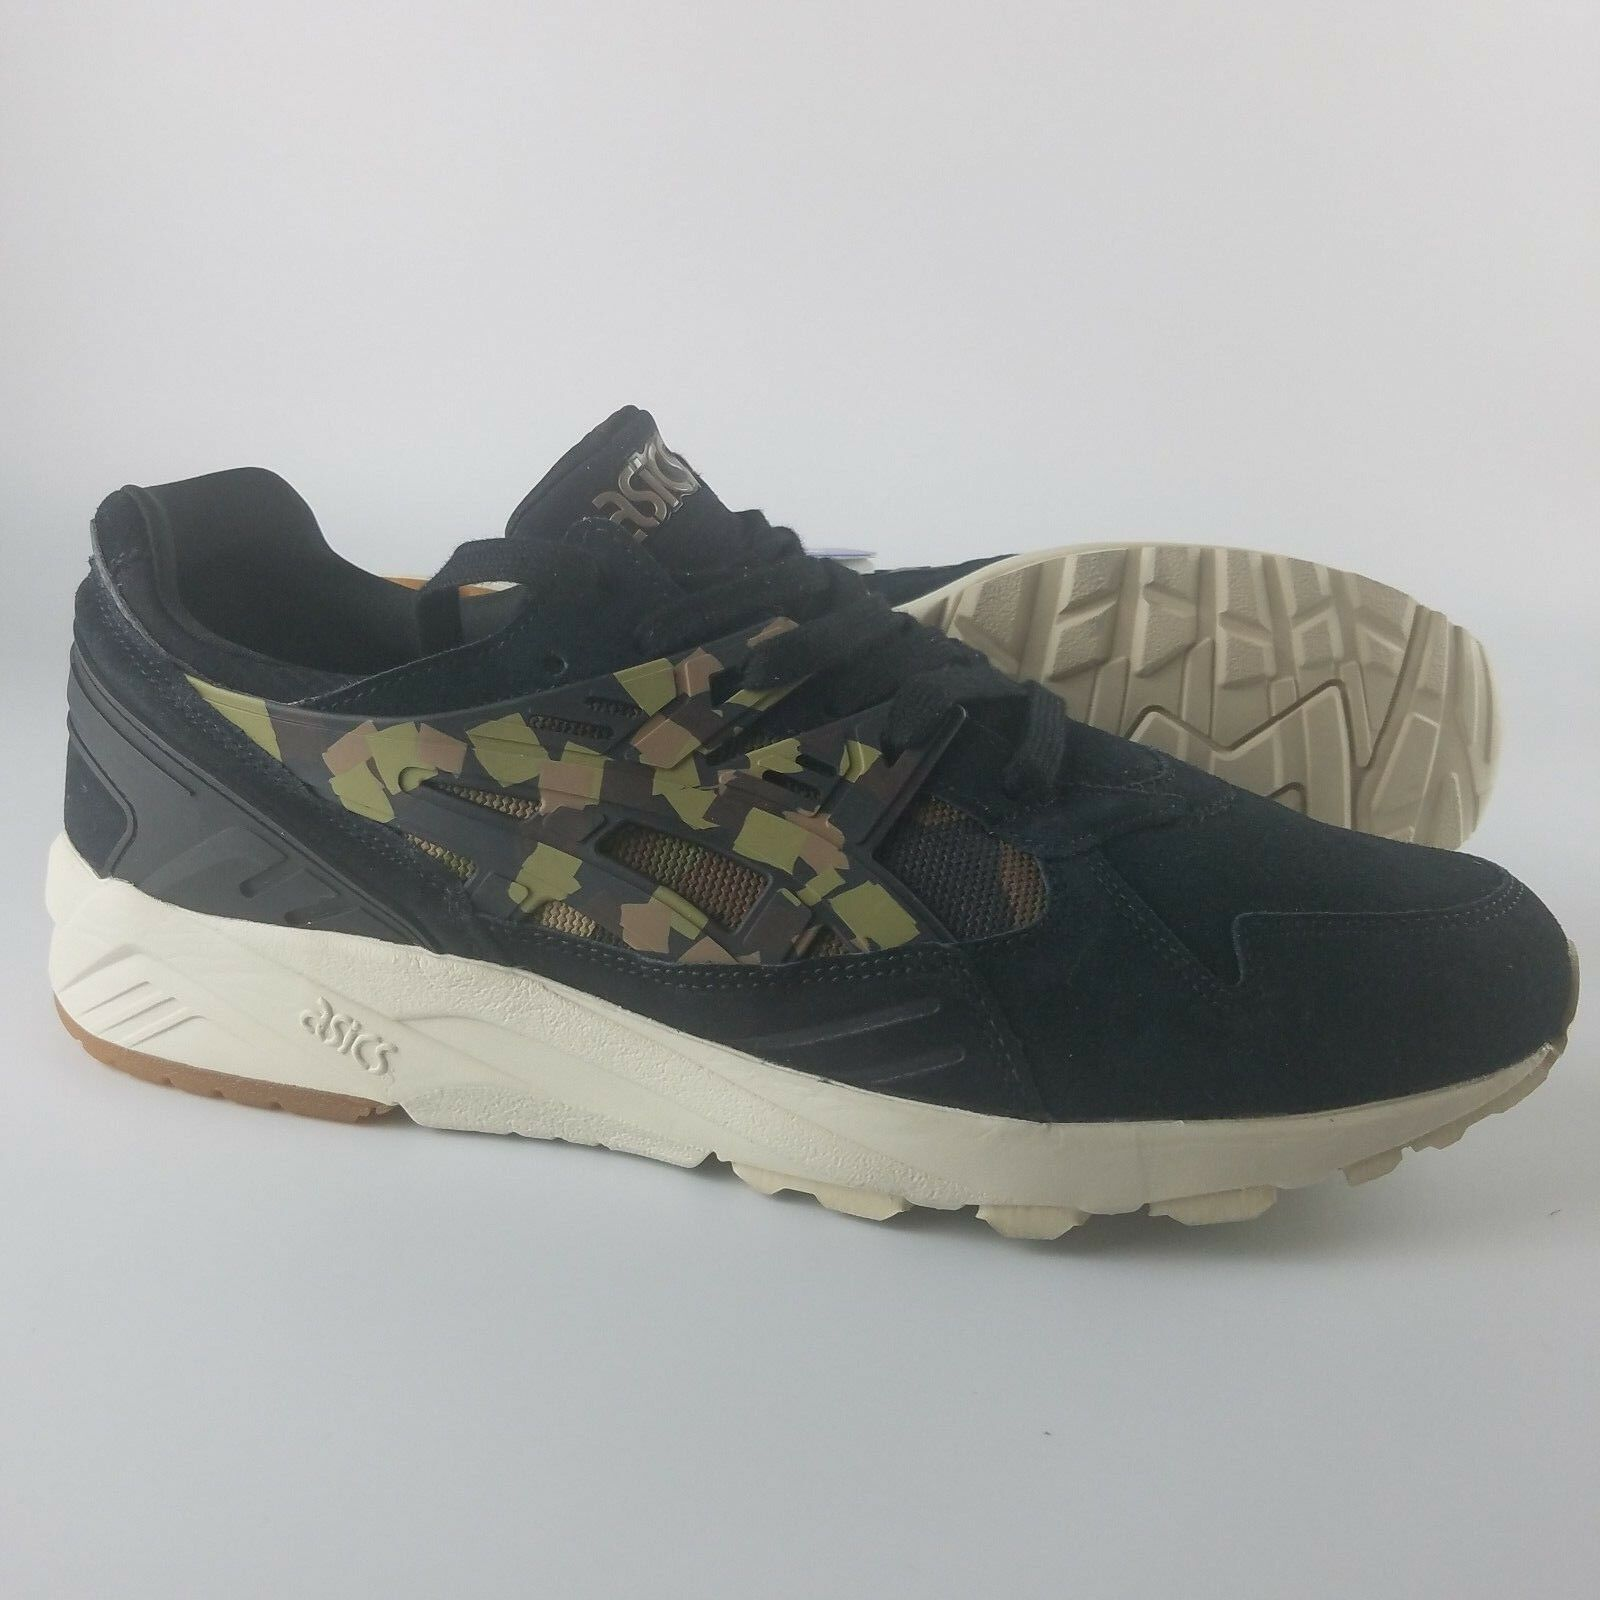 Asics Gel-Kayano Men's Running Shoes HL7C1 Black Martini Olive Forest Camo